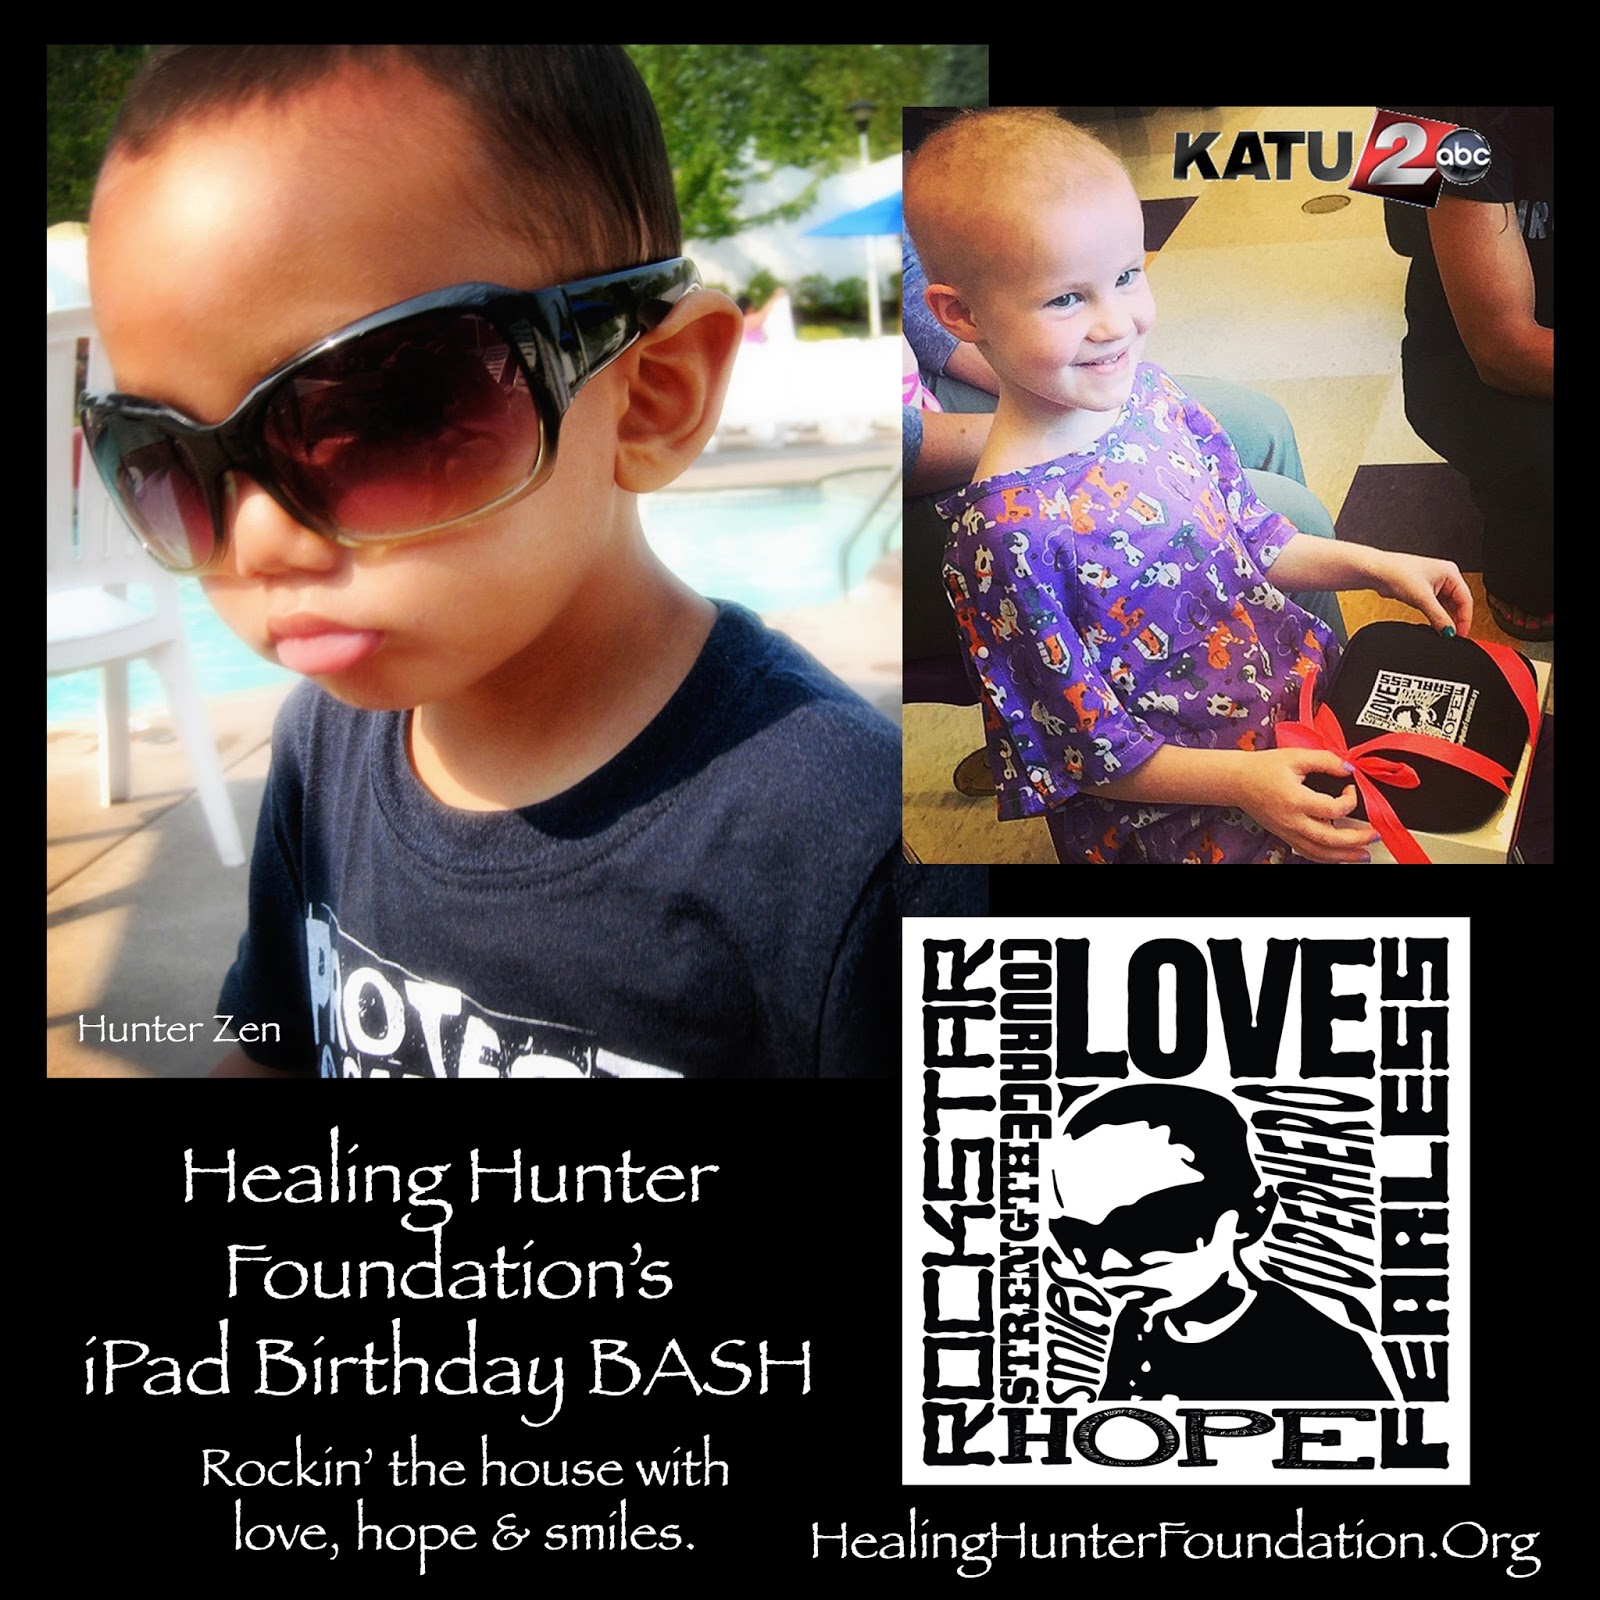 Healing Hunter Foundation 2017